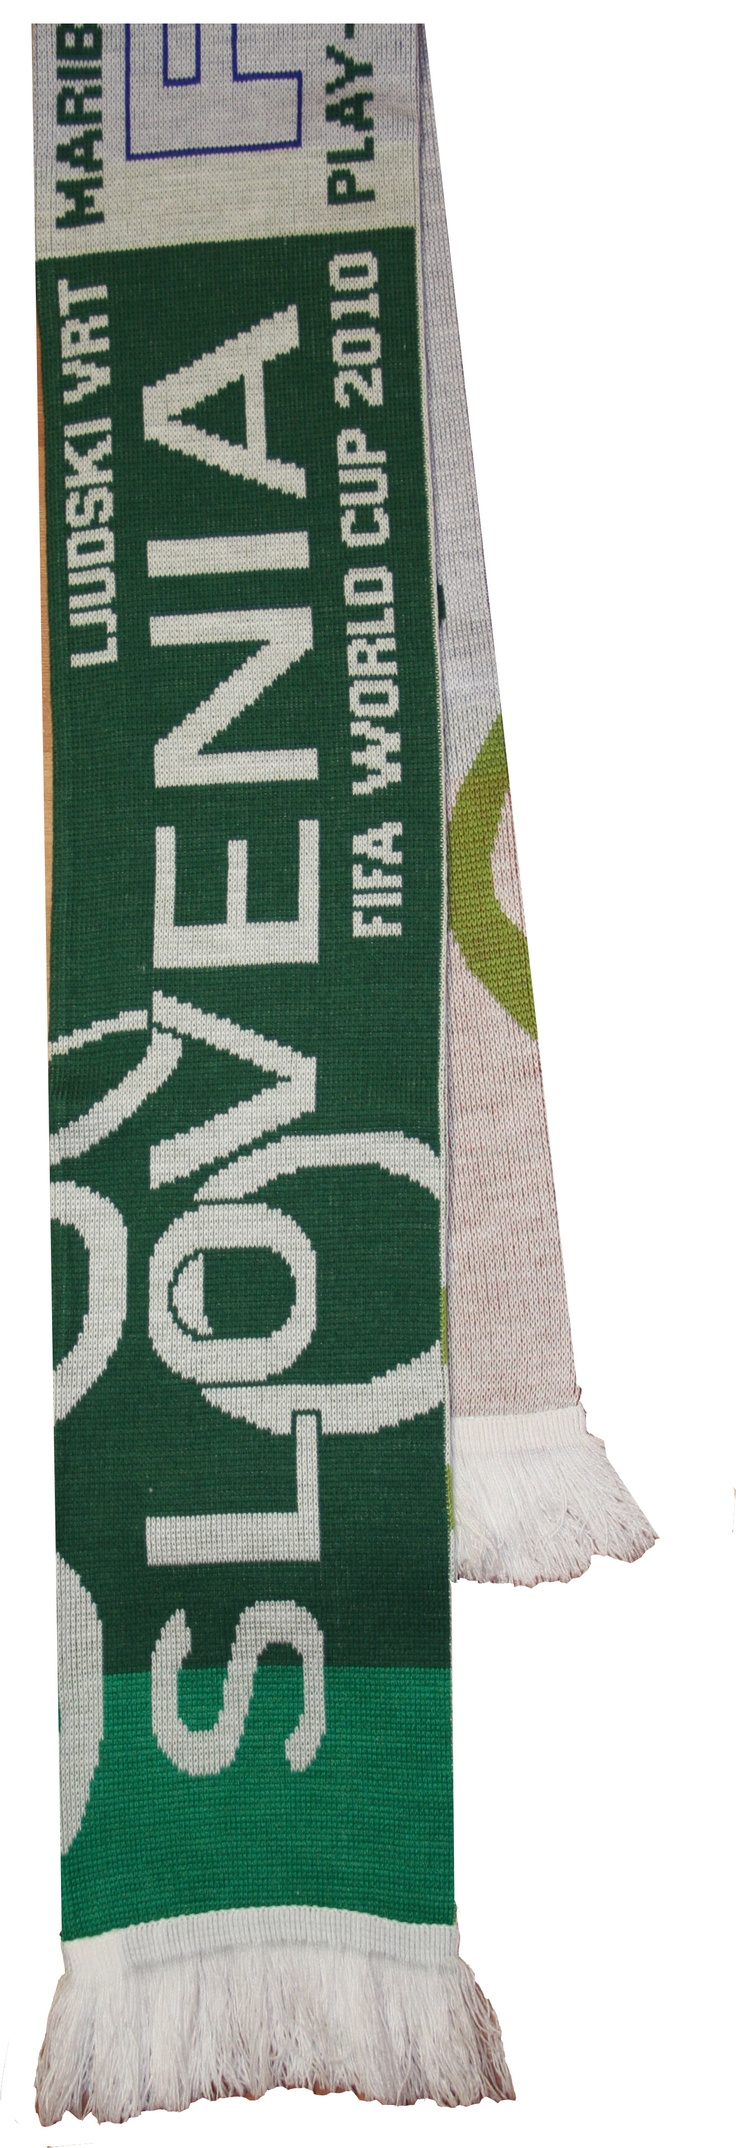 Sampiyon Sport / Acrylic Knitted SLOVENIA Jacquard Scarf